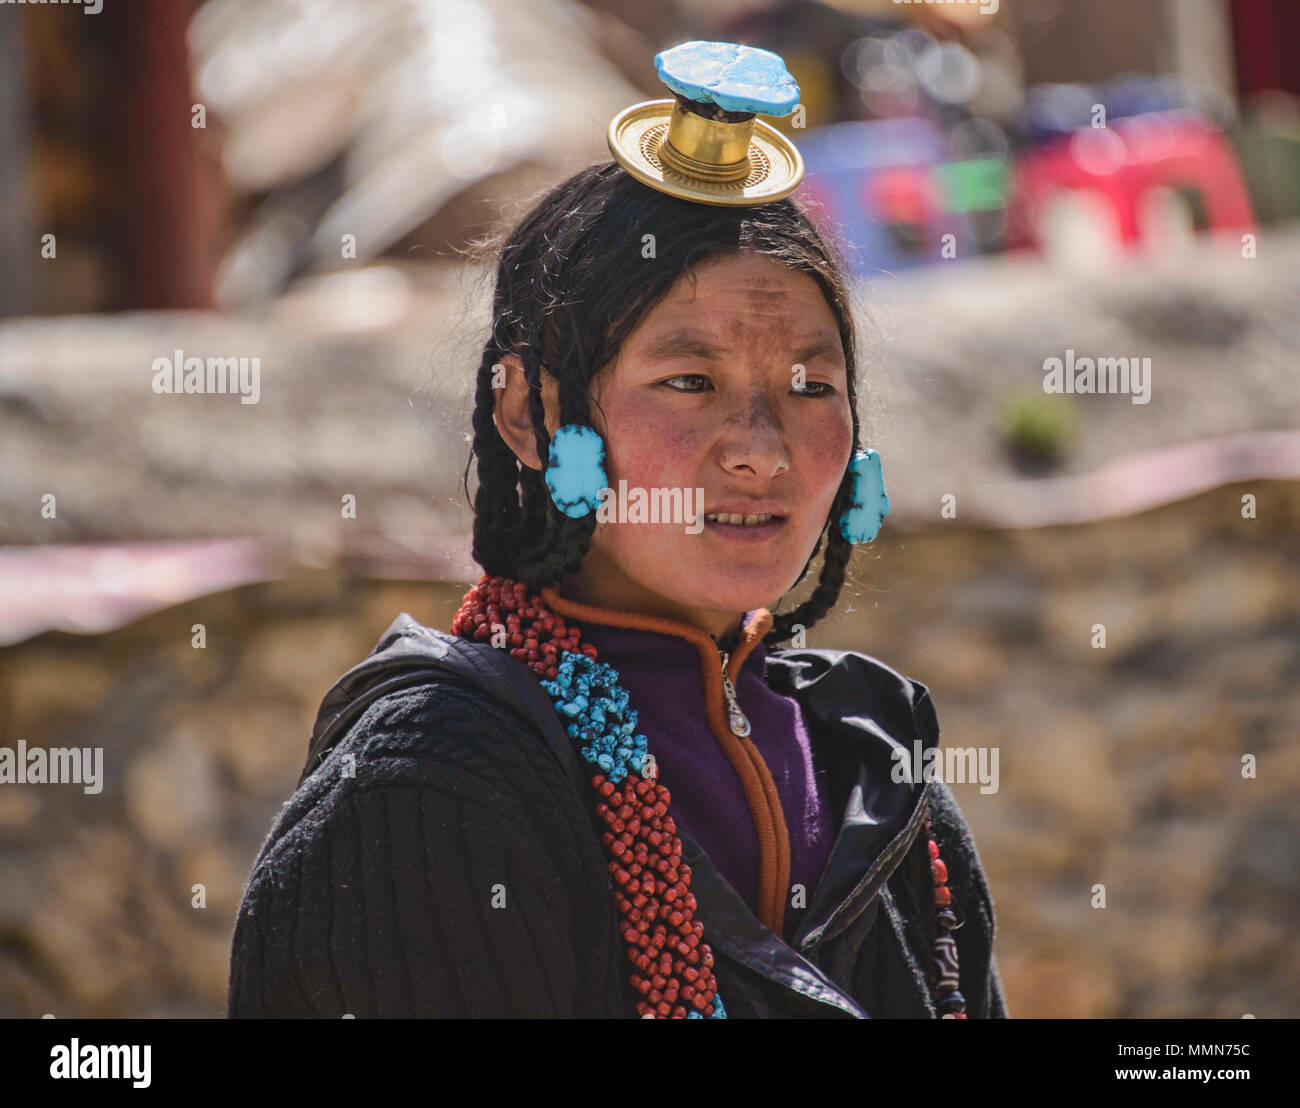 Ritratto di una donna tibetana al Bakong scrittura Stampa Monastero a Dege, Sichuan, in Cina Immagini Stock